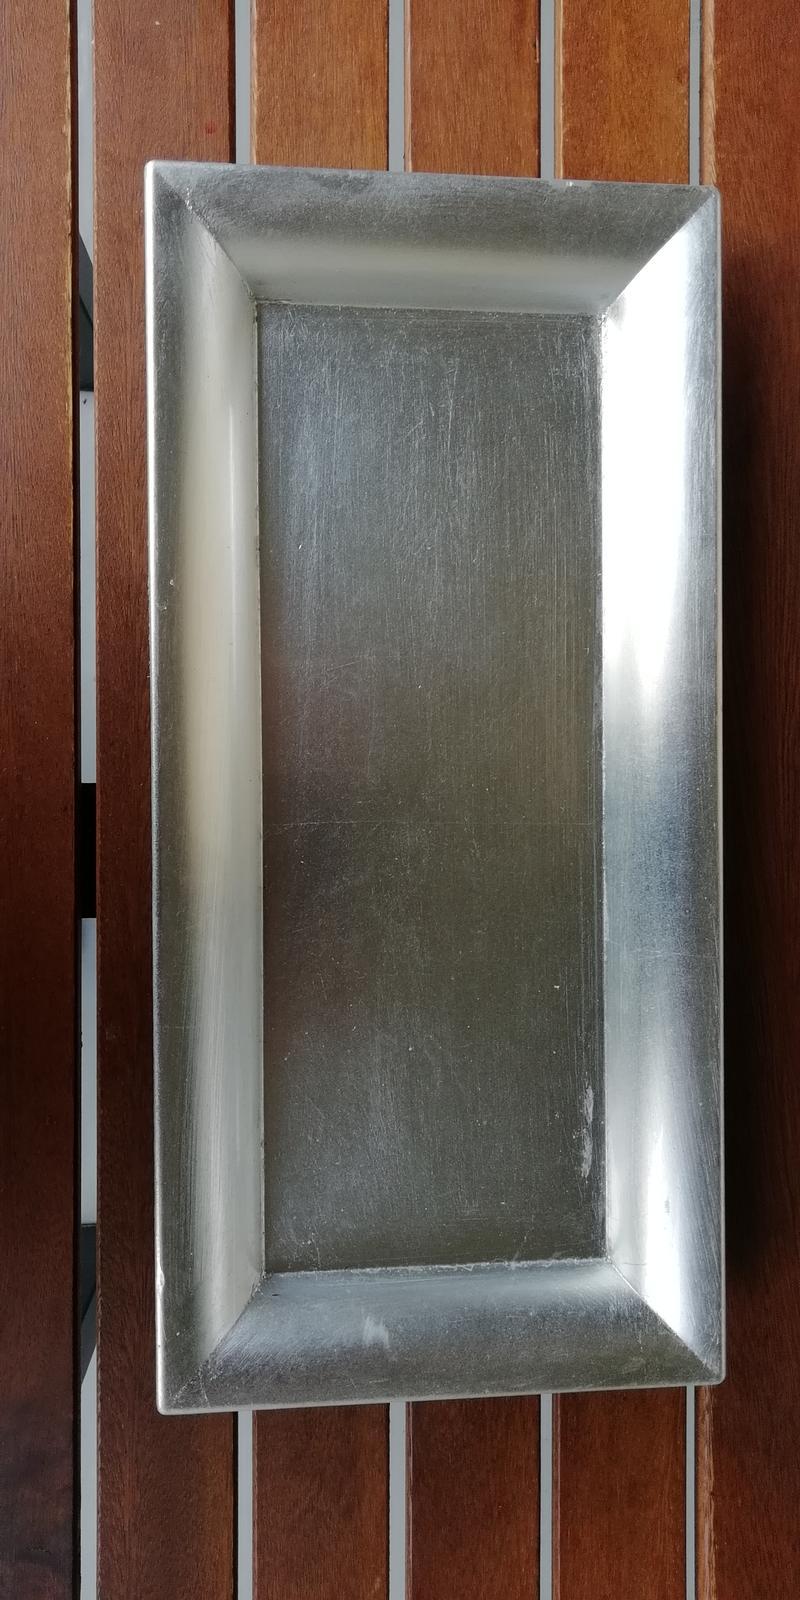 stříbrný podnos - Obrázek č. 2